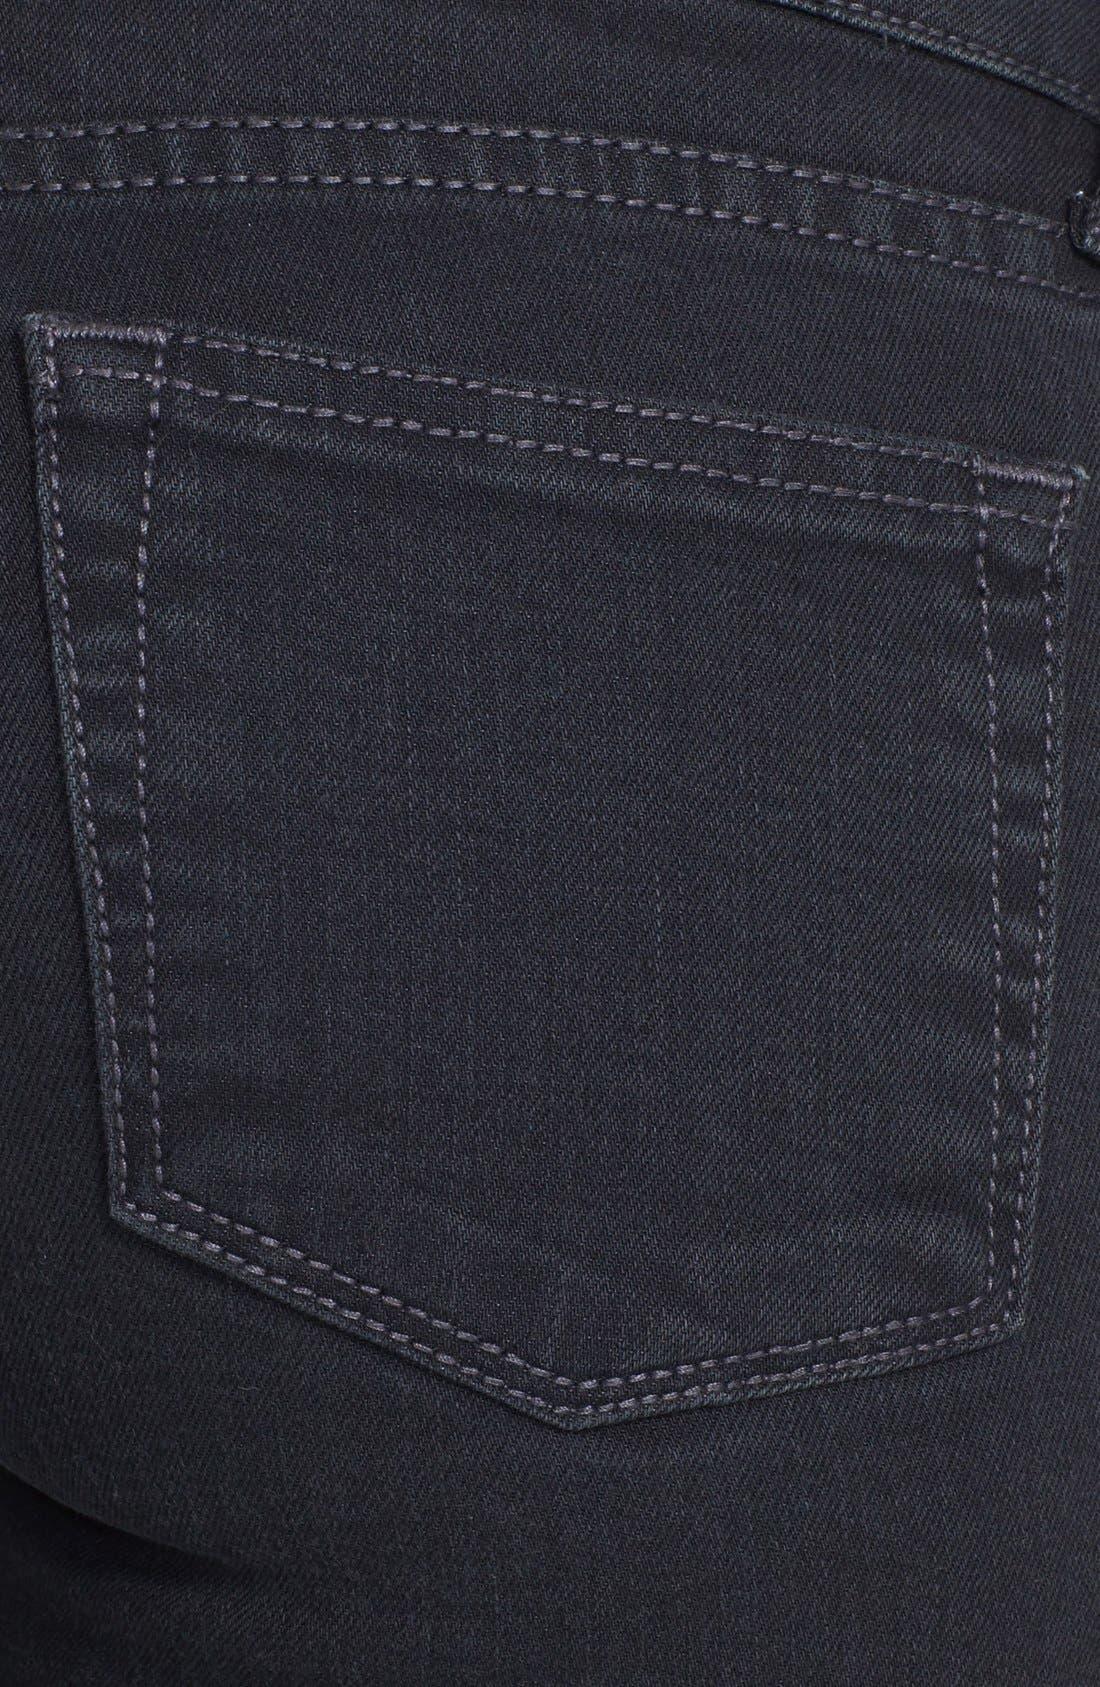 Alternate Image 3  - KUT from the Kloth 'Elle' Skinny Jeans (Interest)